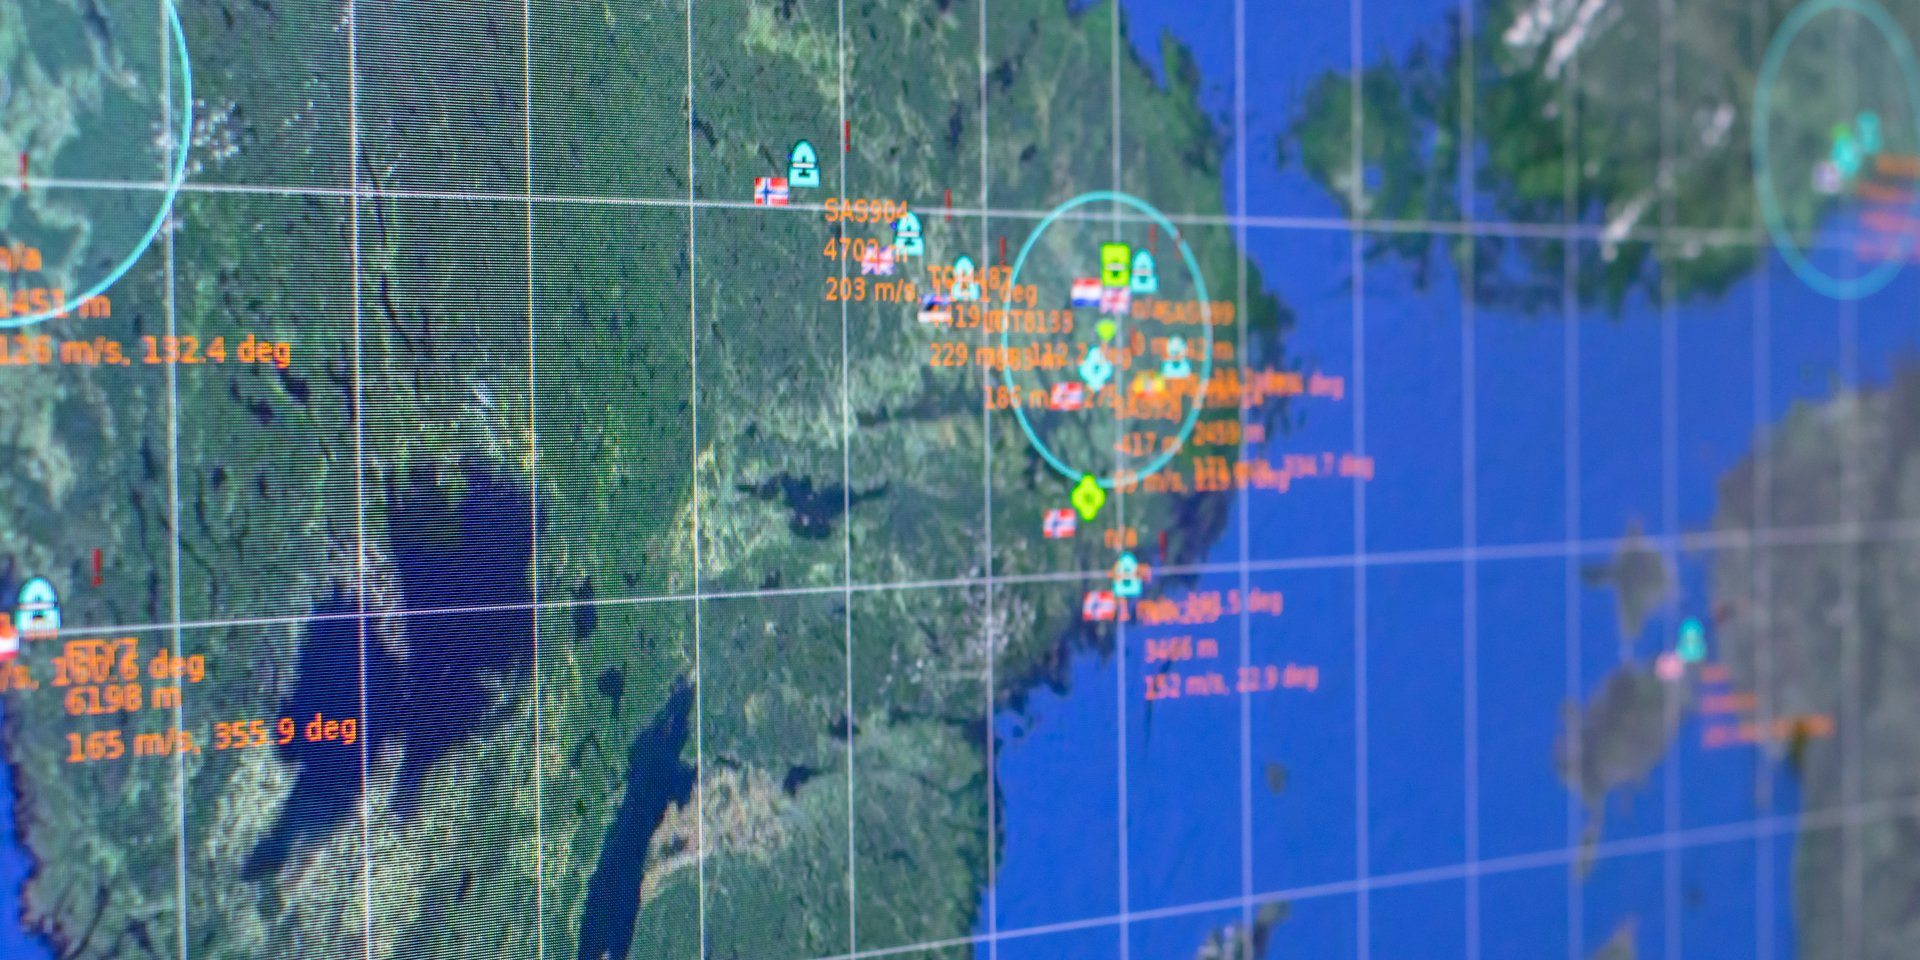 Map-display-at-EyesOnHelsinki-1920px-wide